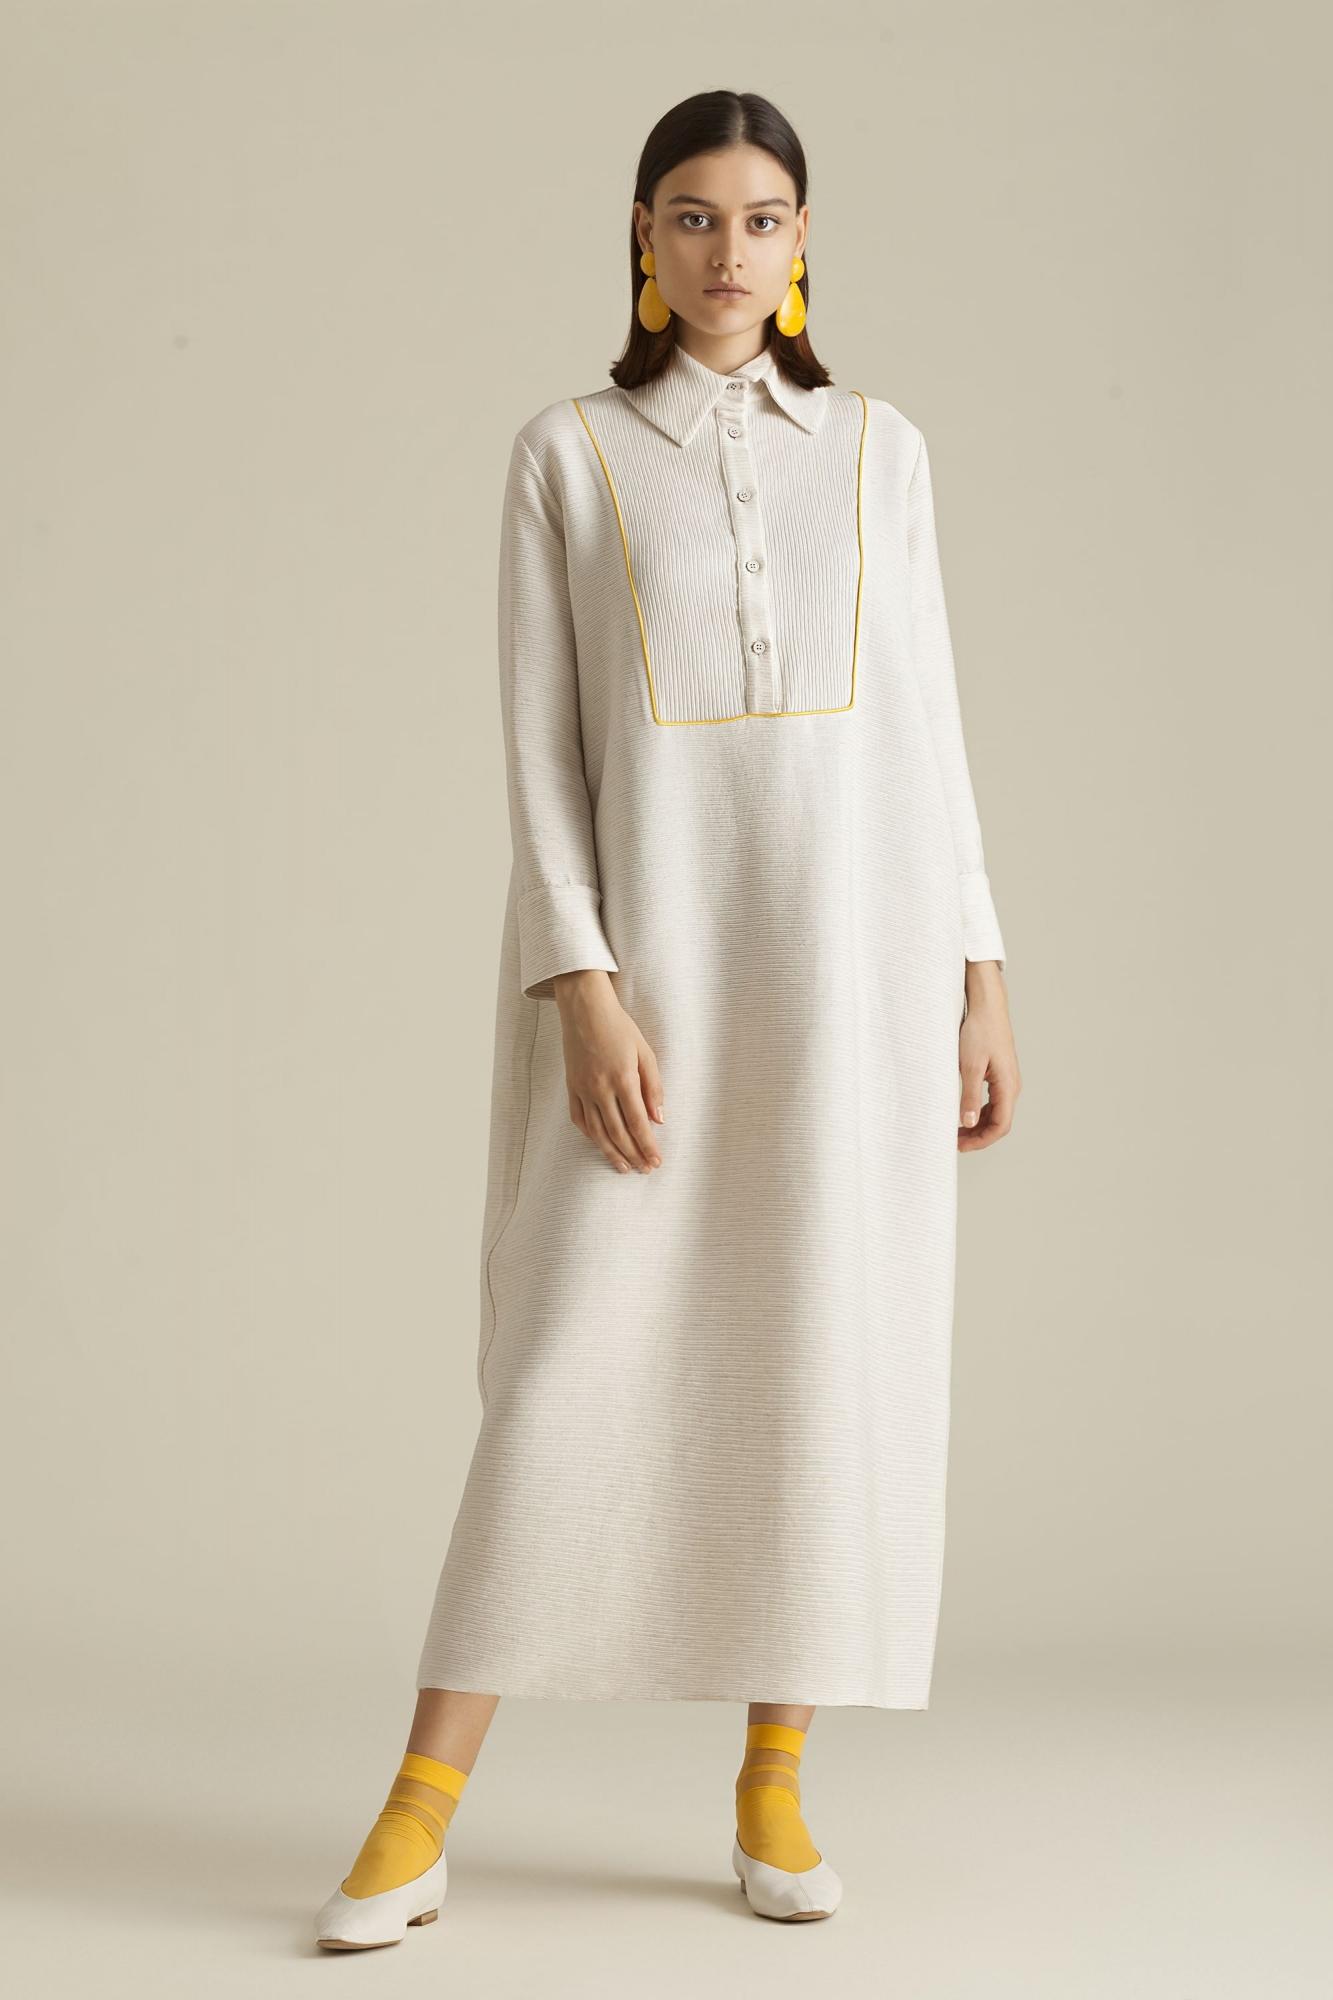 Kuaybe Gider - 2059 Elbise Ekru-Sarı